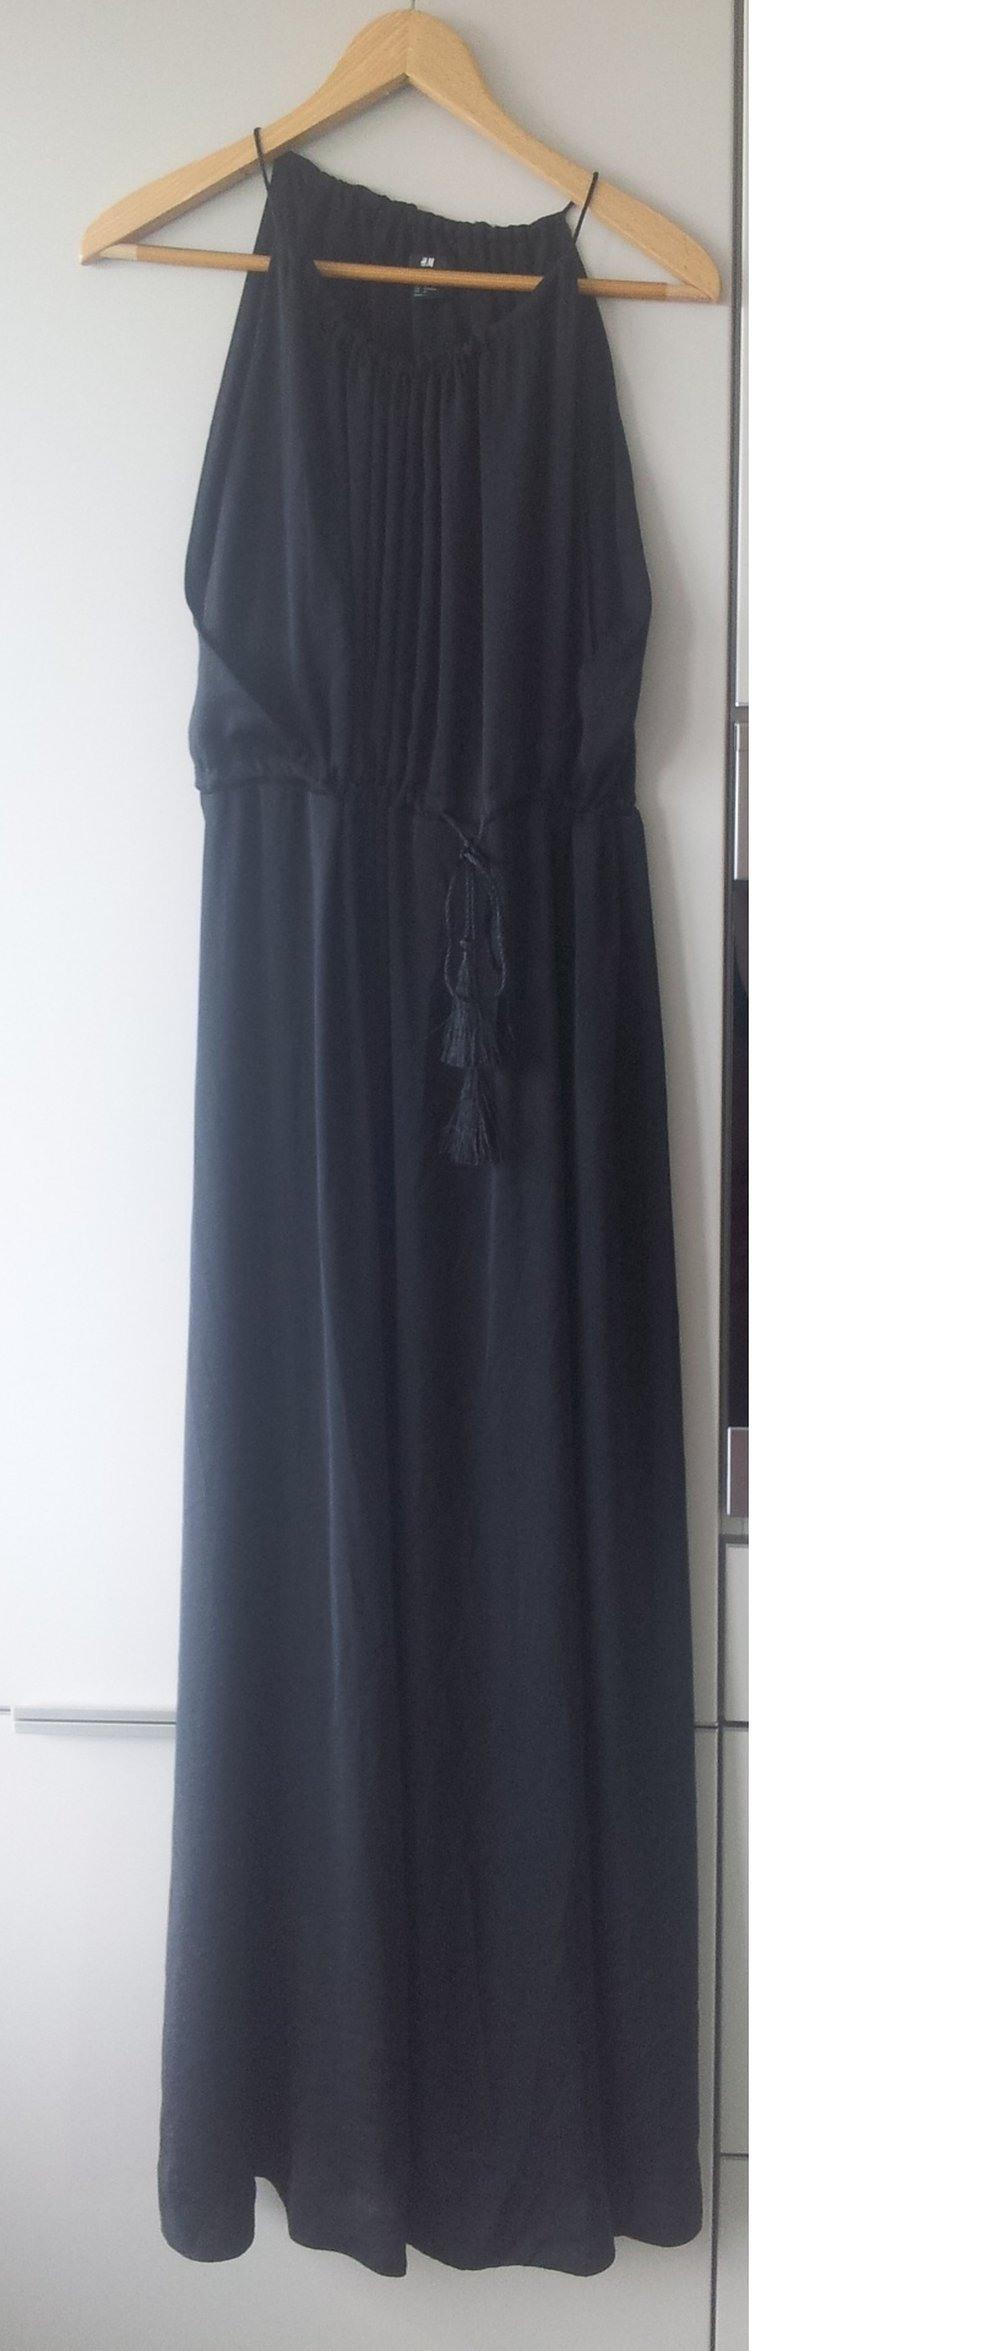 Perfekt Bodenlanges Schwarzes Kleid BoutiqueAbend Perfekt Bodenlanges Schwarzes Kleid Ärmel